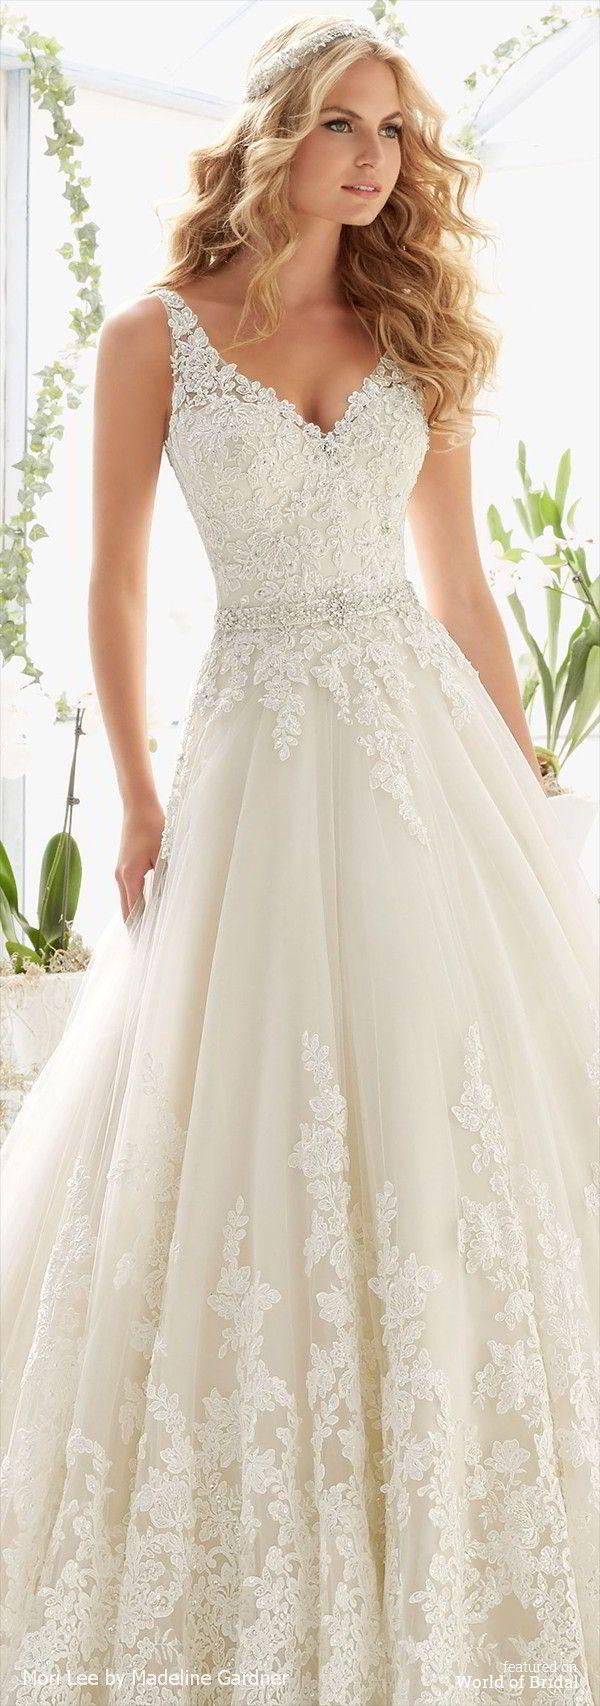 wedding dresses wedding gowns Mori Lee by Madeline Gardner Spring Wedding Dresses